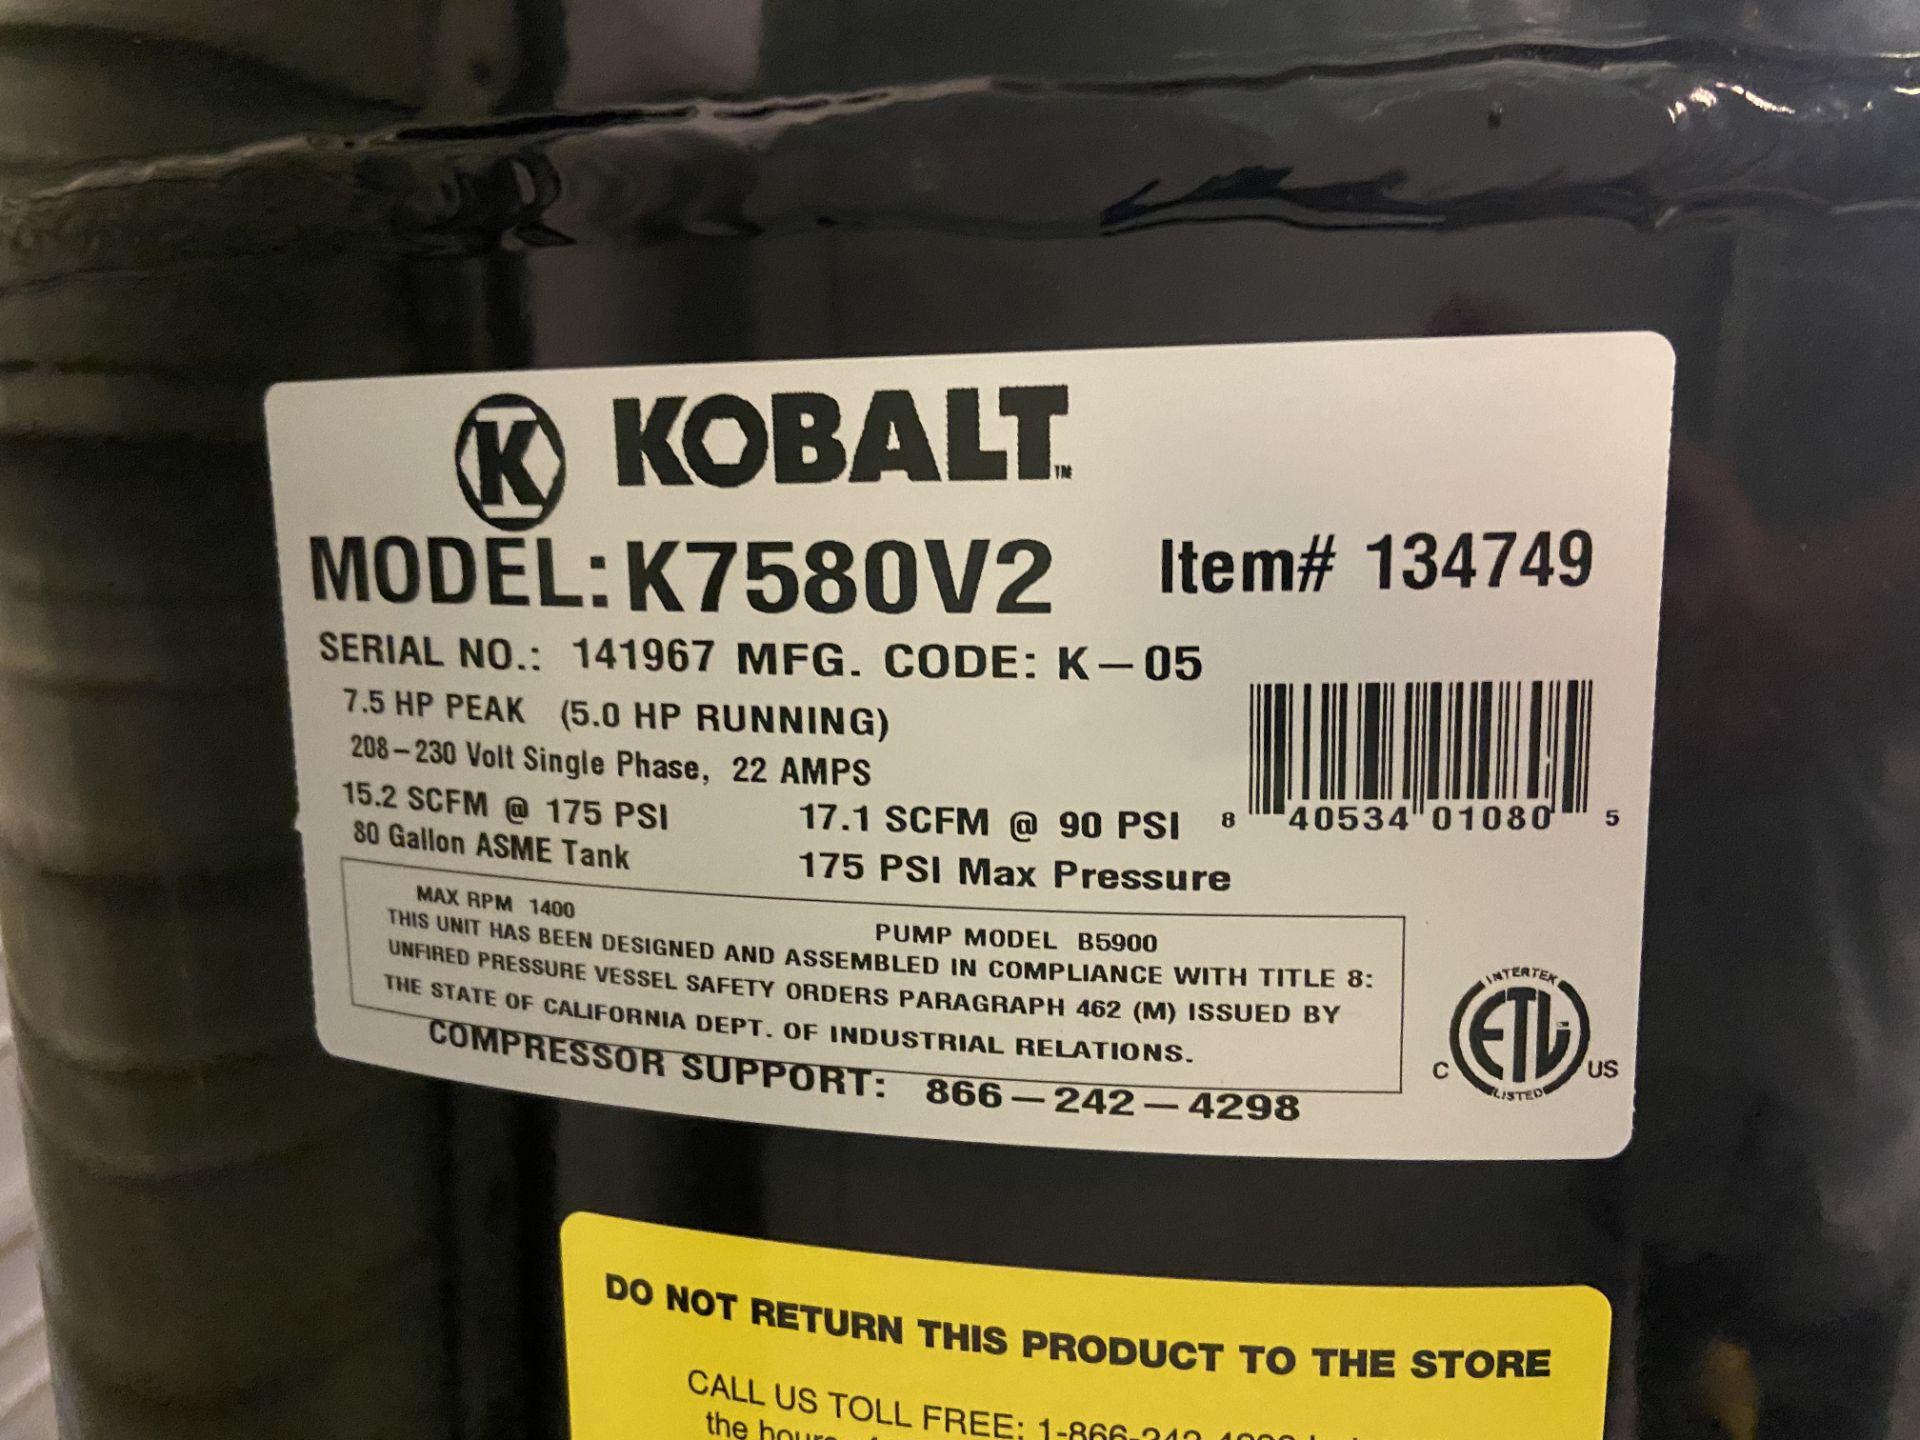 Kobalt Air Compressor, Model# K7580V2, Serial# 141967, 7.5 HP Peak (5 HP Running), 175 Max PSI, - Image 2 of 4